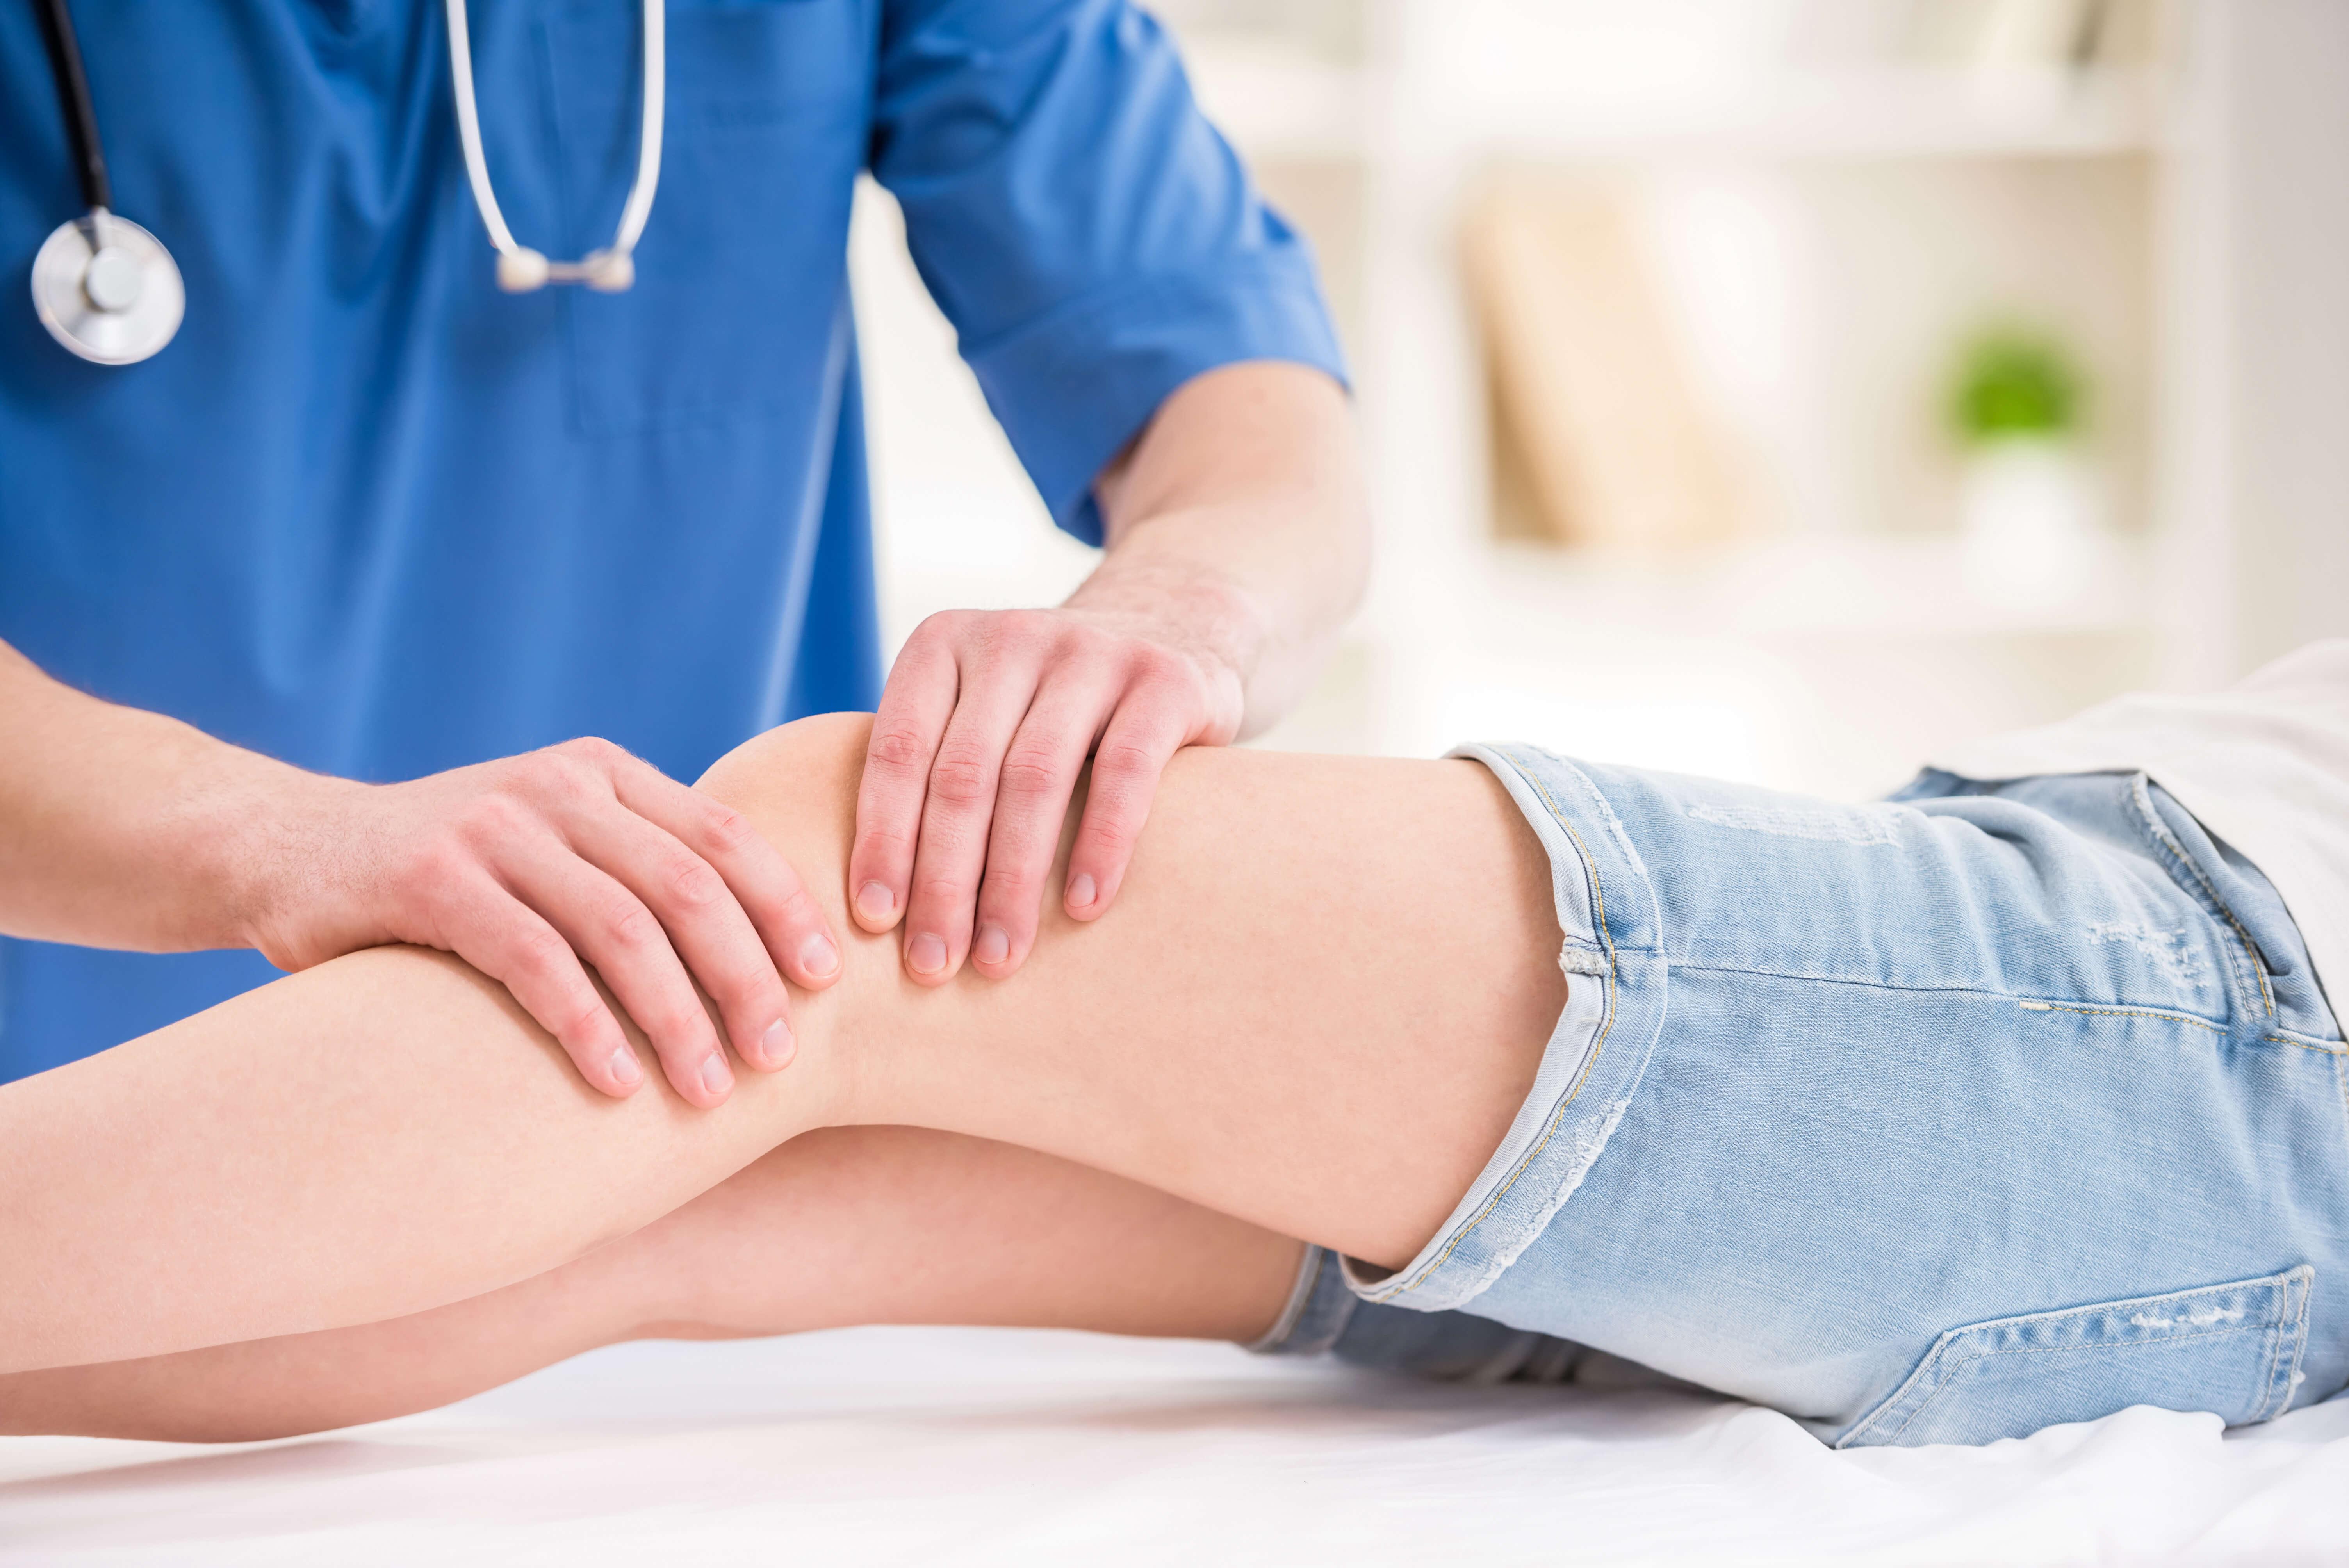 Therapeutic Knee Massage